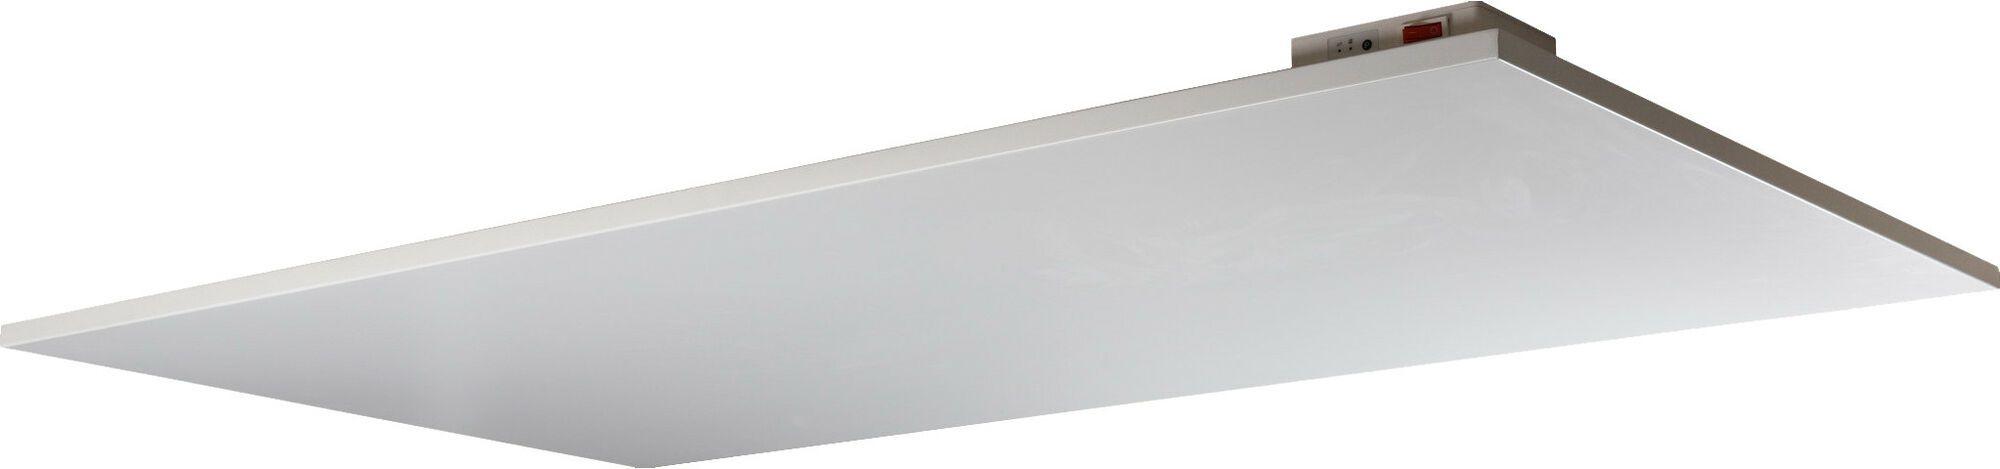 Mon Soleil 800 ceiling Wifi | Infrarood plafond kachel